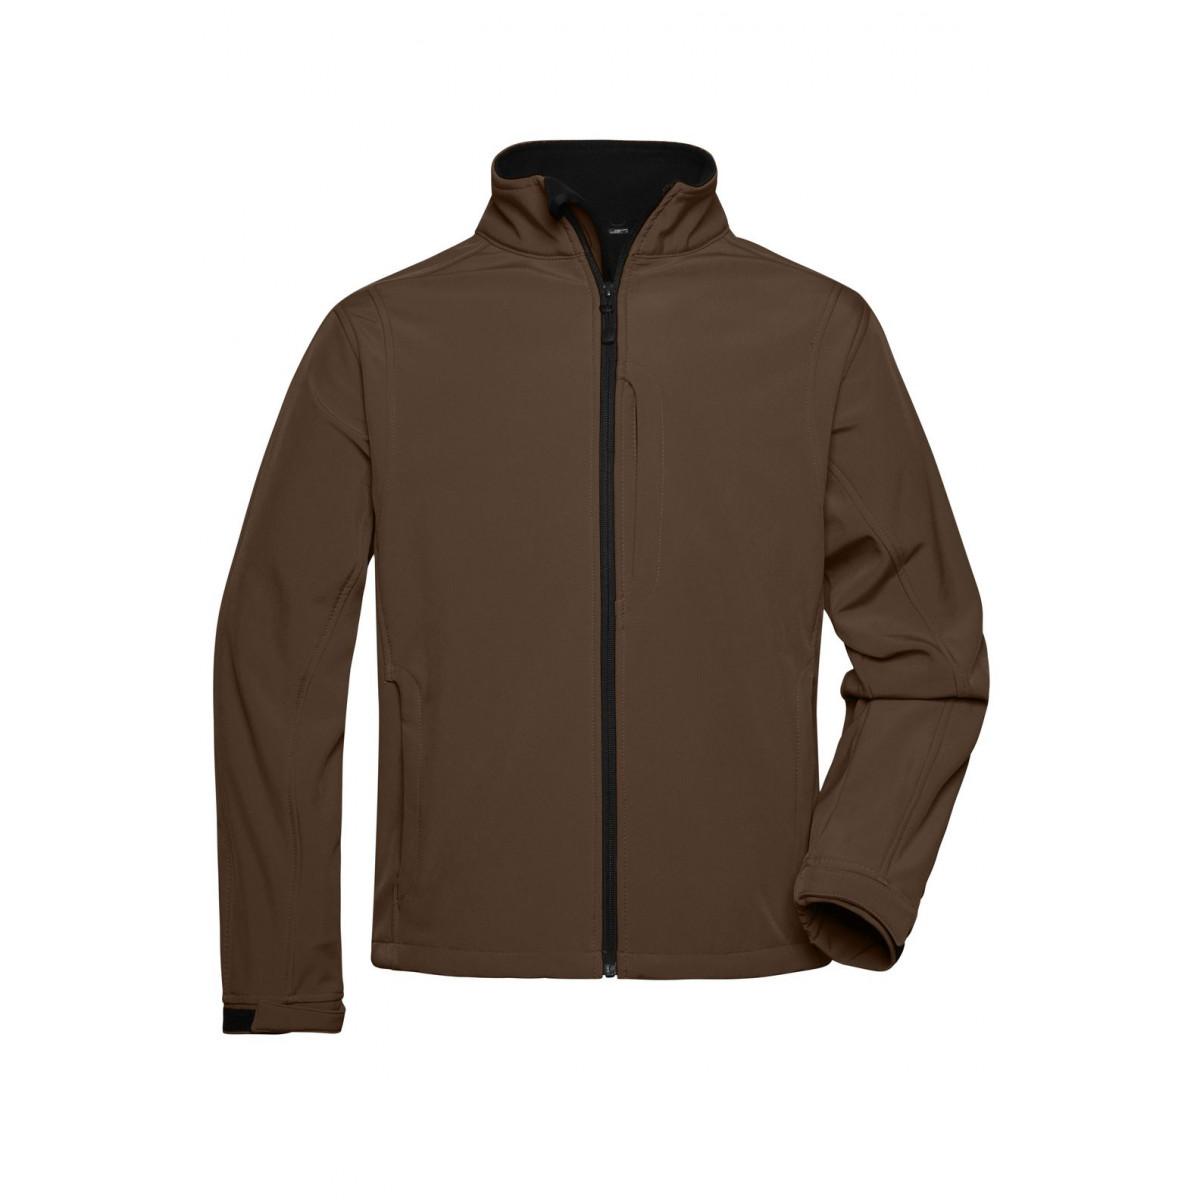 Куртка мужская JN135 Mens Softshell Jacket - Коричневый